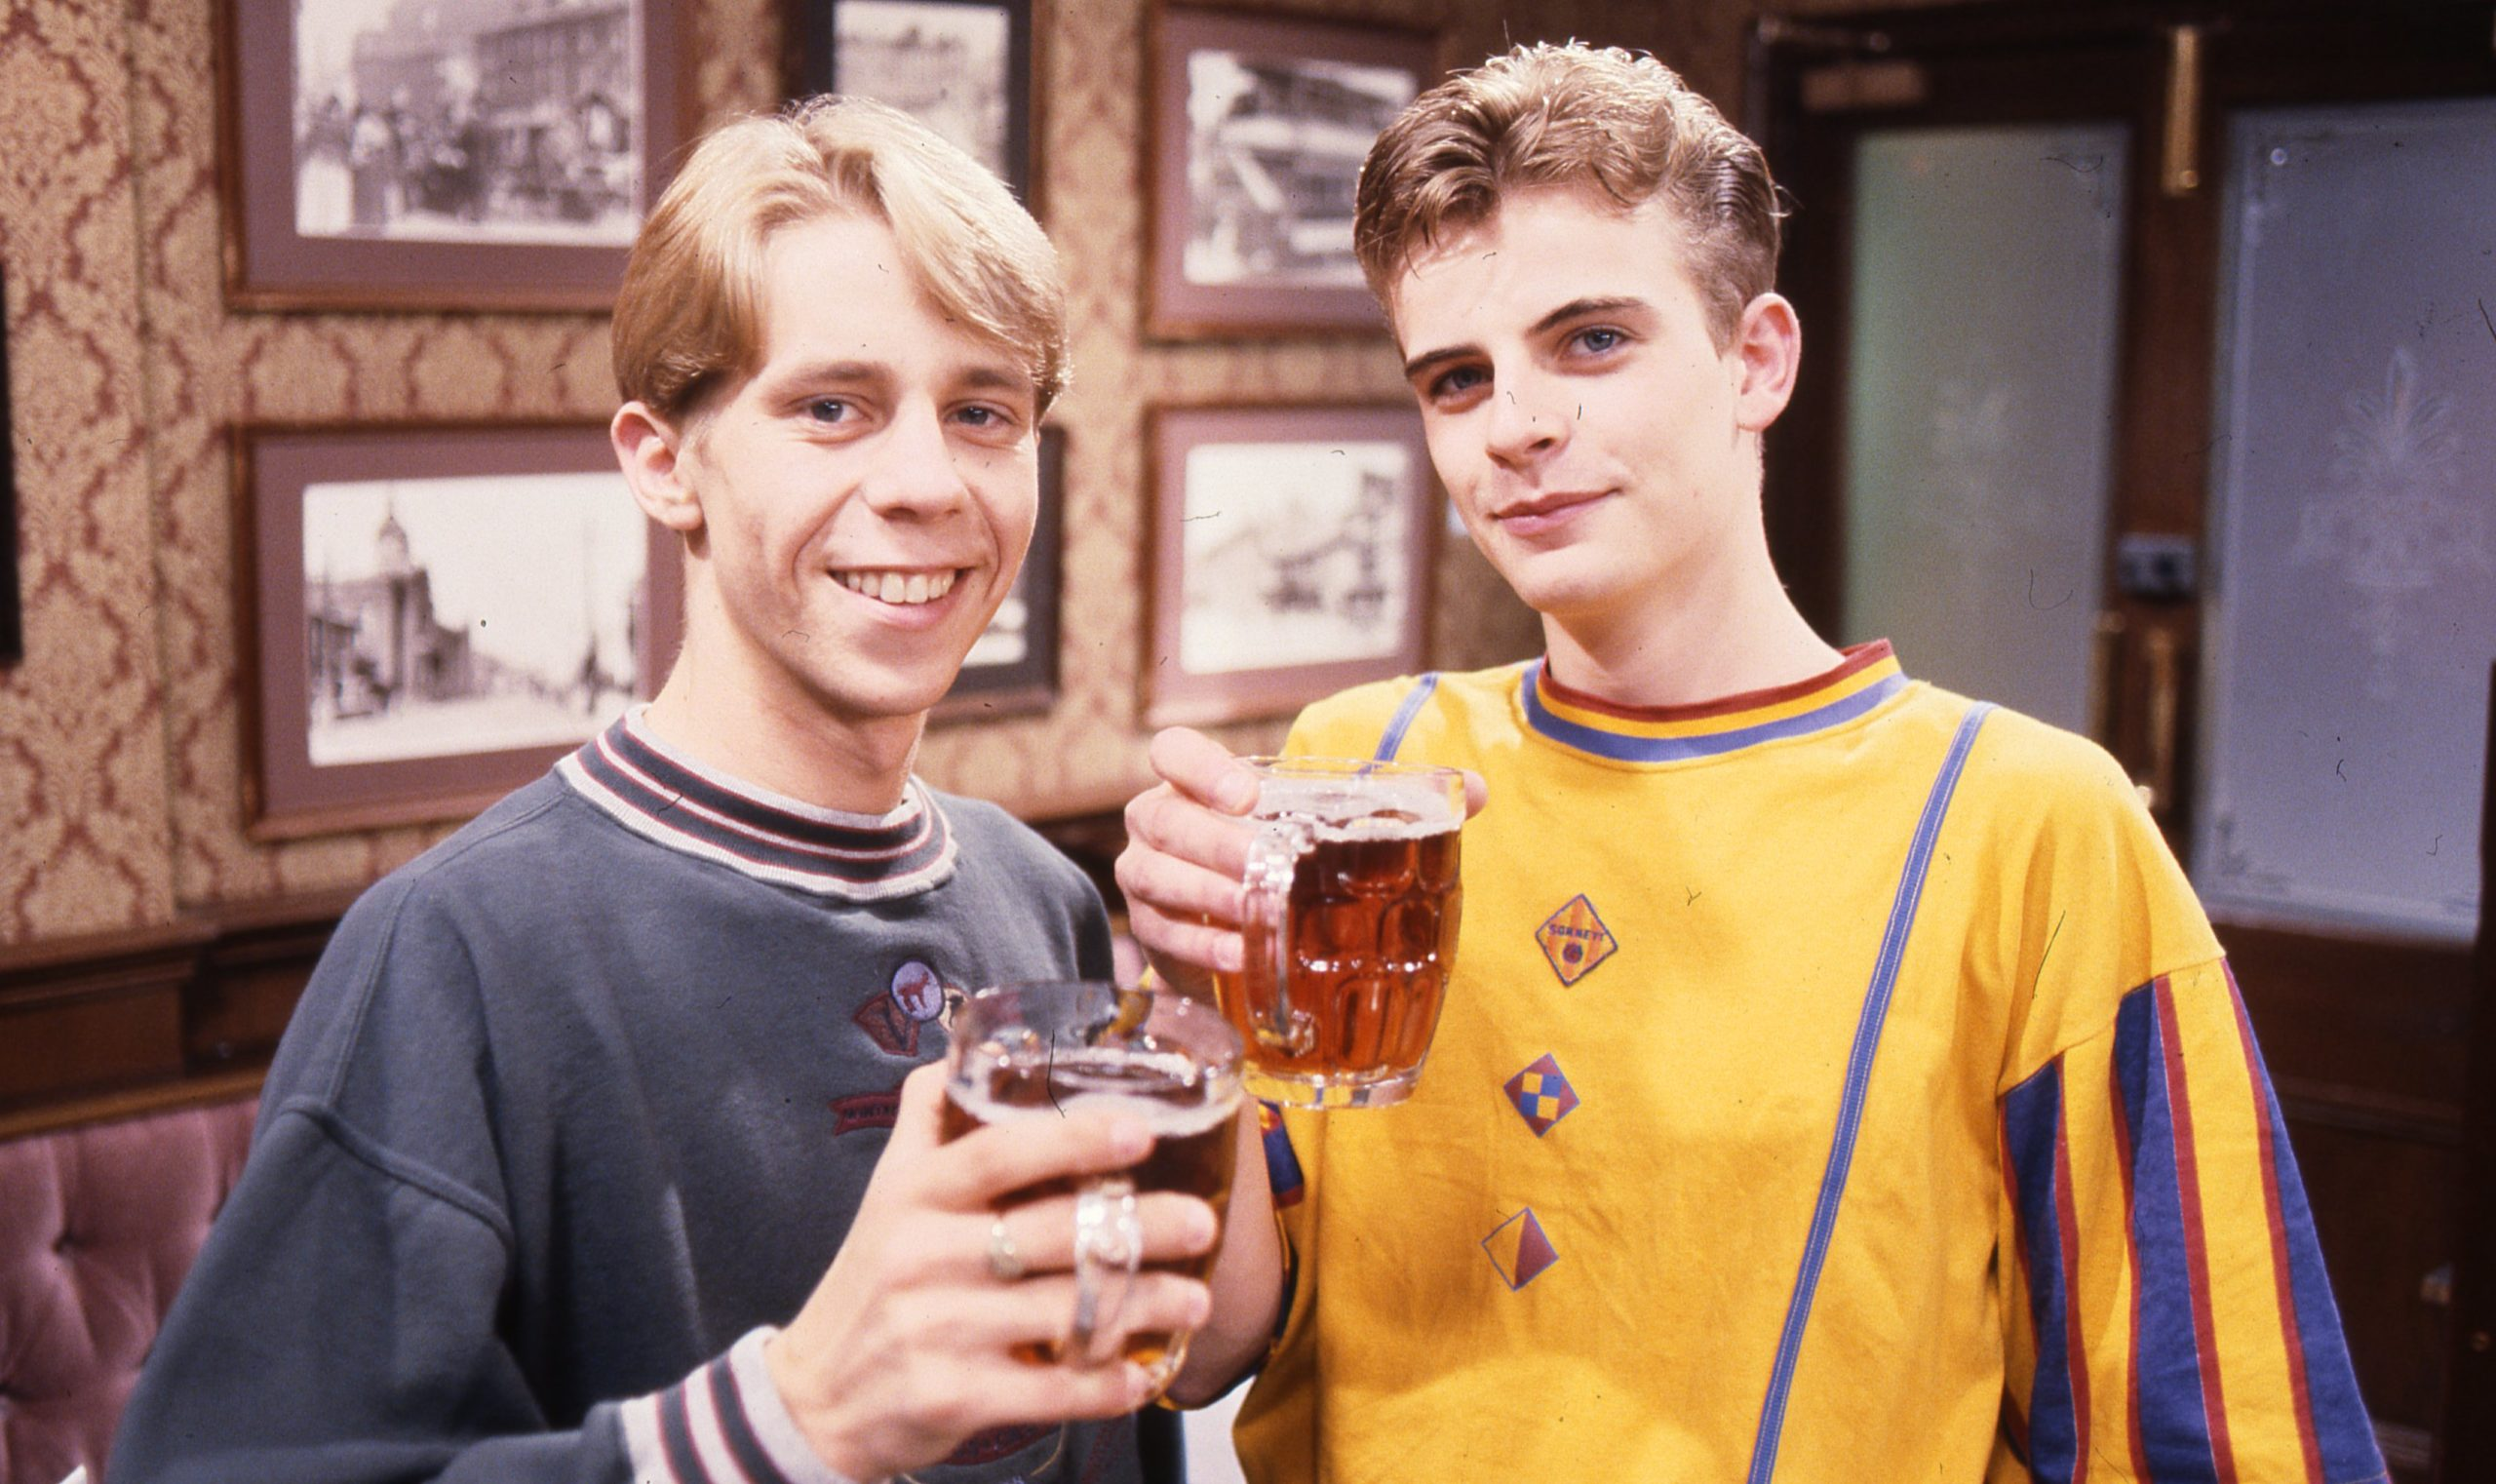 Andy and Steve McDonald Nick Cochrane Coronation Street Credit: ITV/Shutterstock